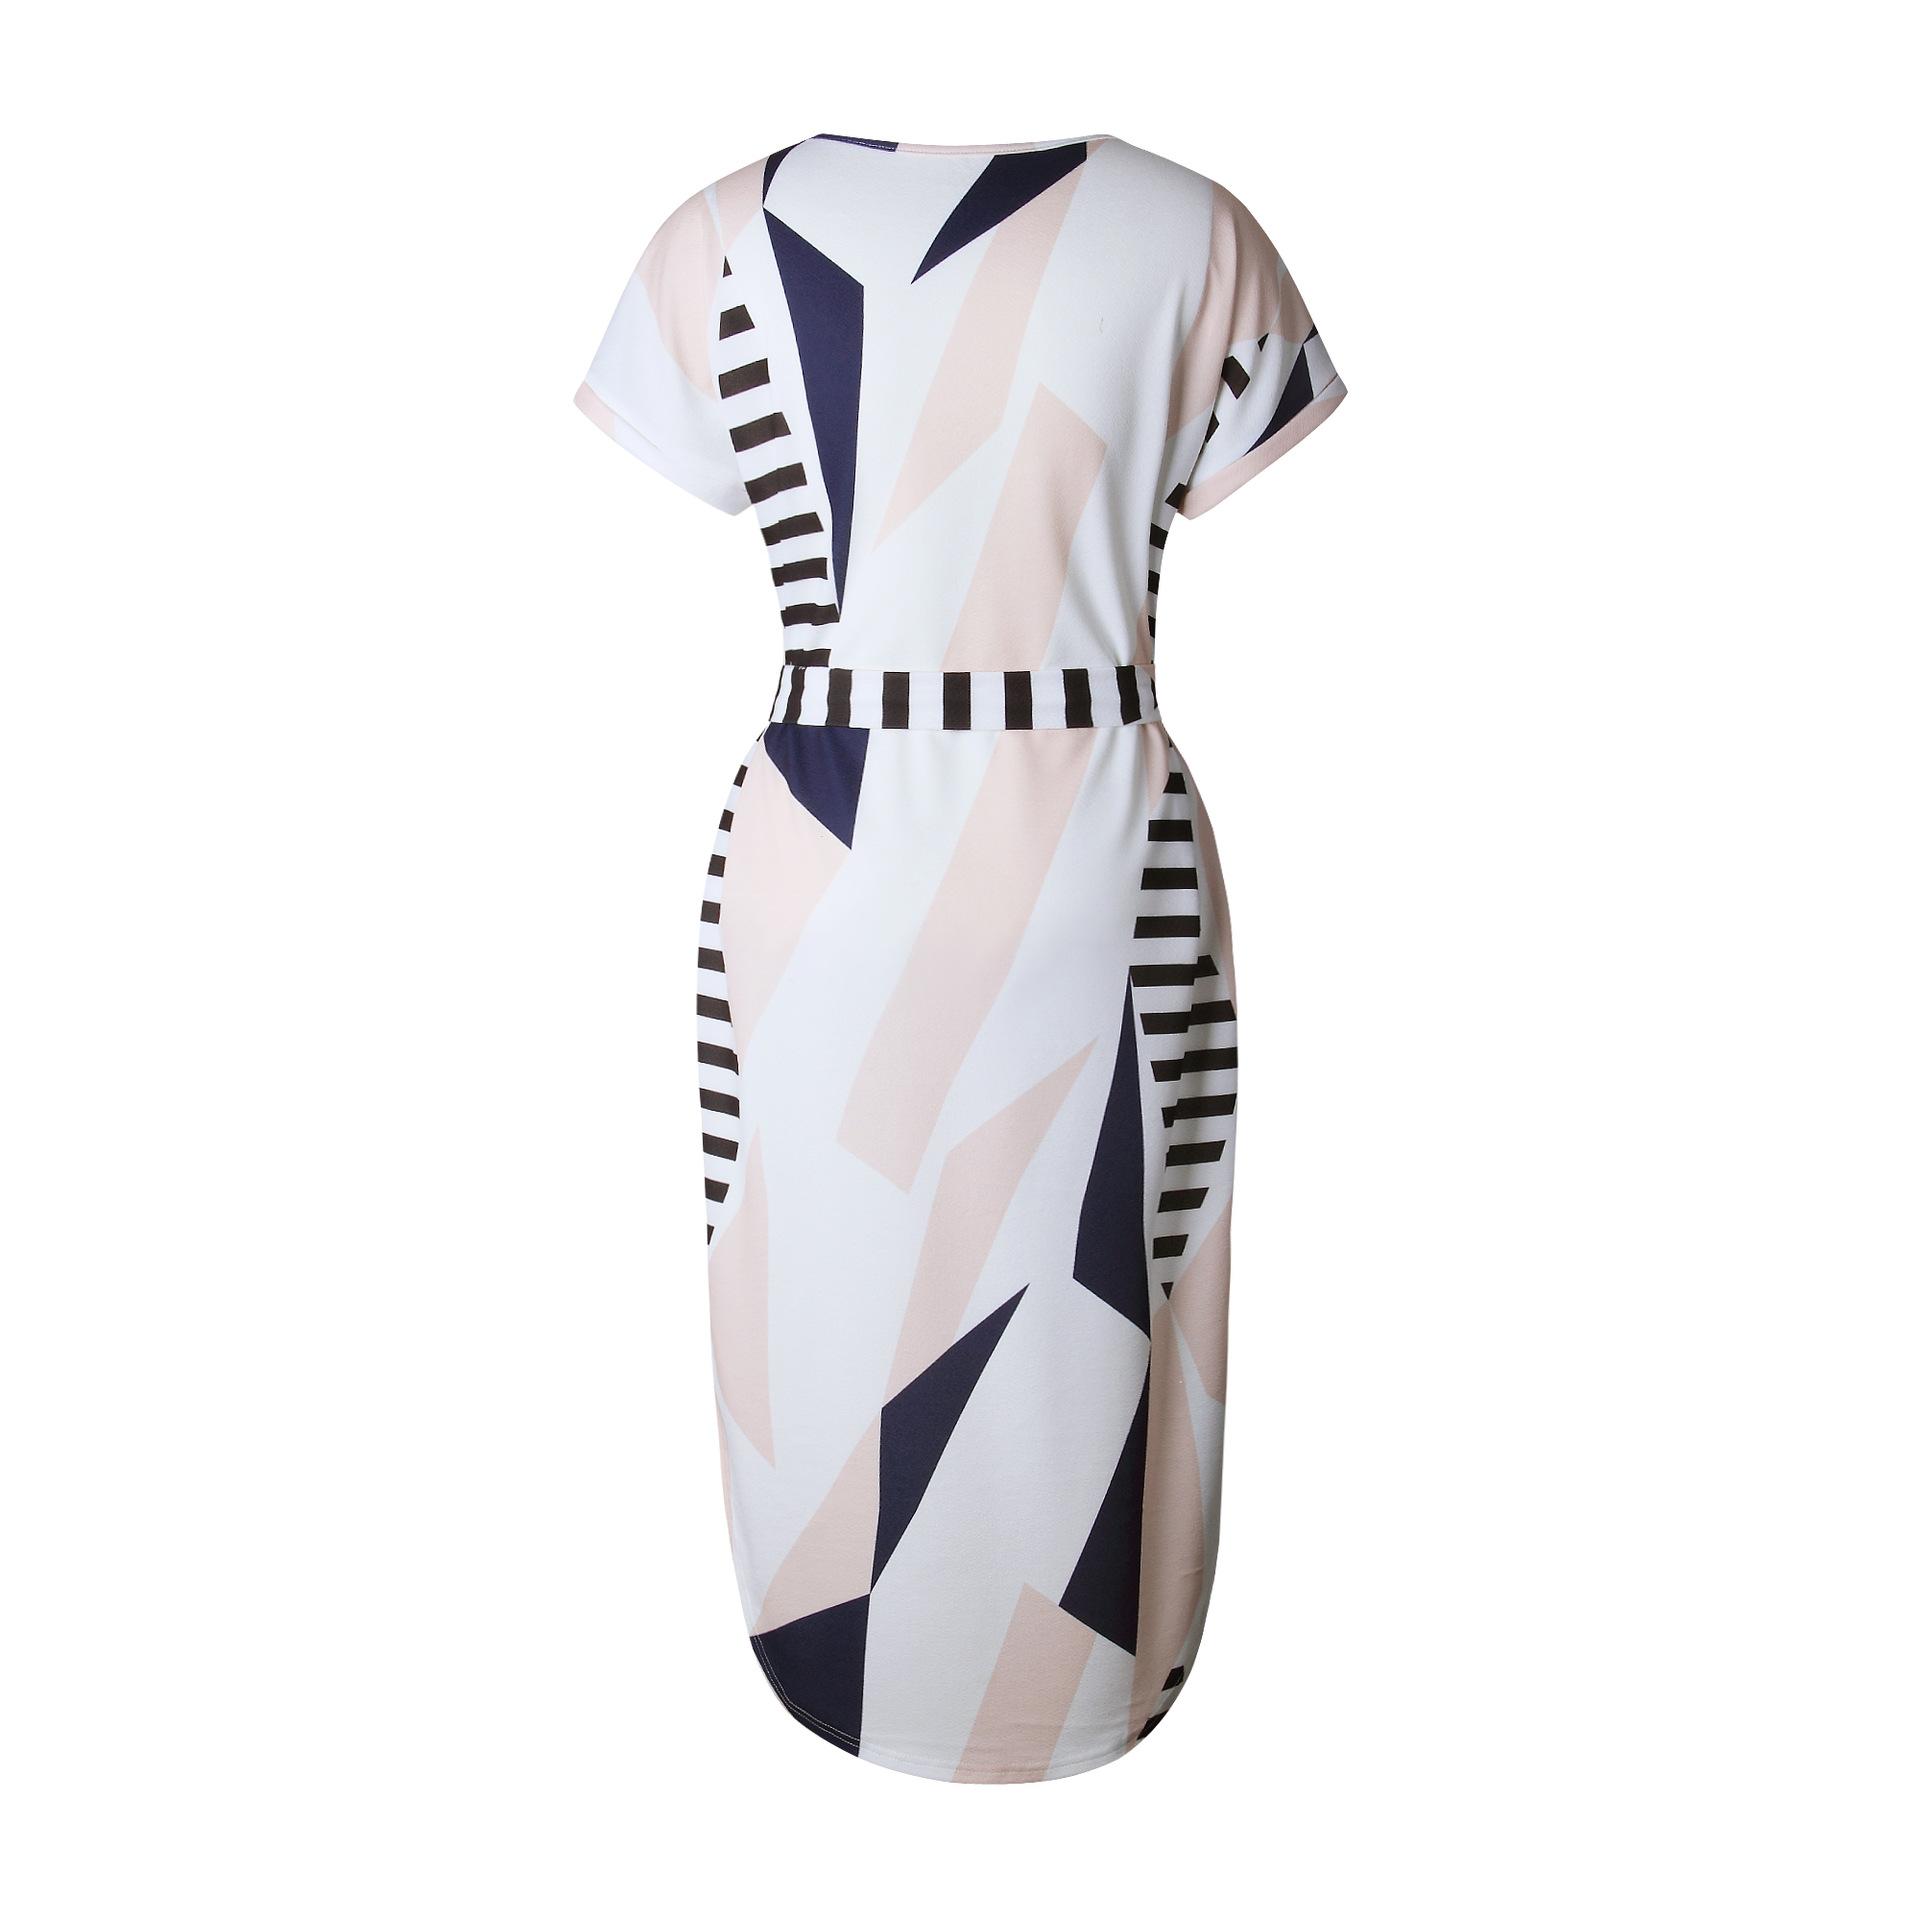 2018 Summer Dress Women Print V Neck Short Sleeve Robe Female Dresses Casual Sashes Midi Dress Ladies Elegant Vestidos Dropship 9